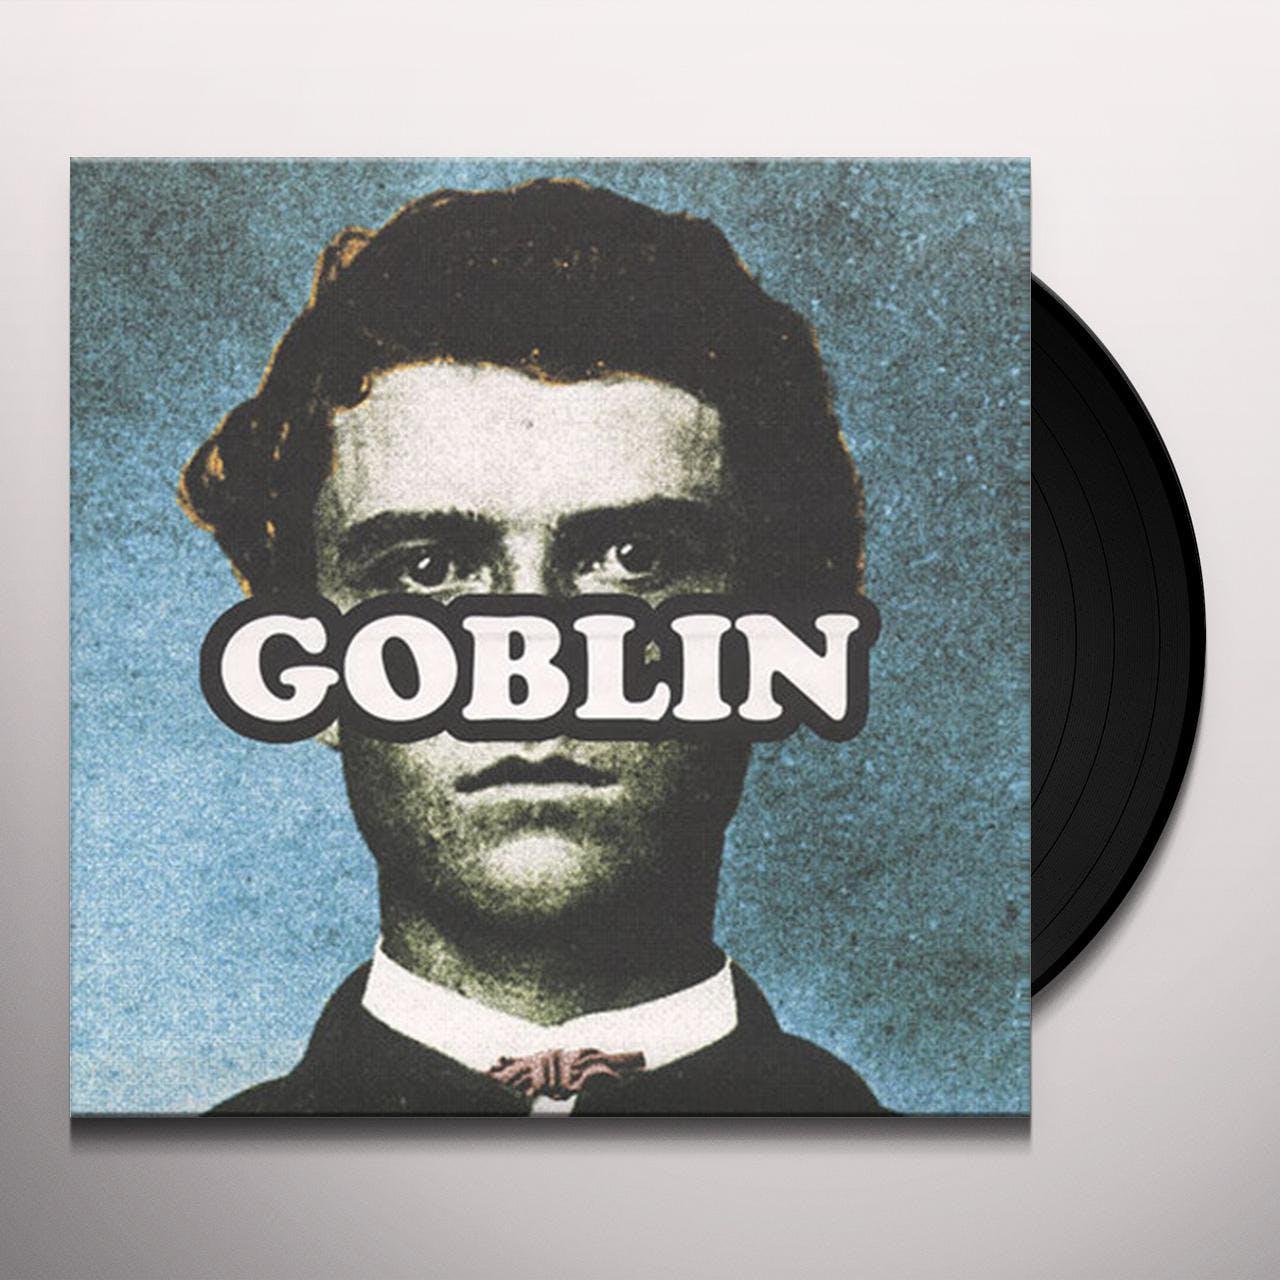 Tyler The Creator Goblin With Mp3 Download Vinyl